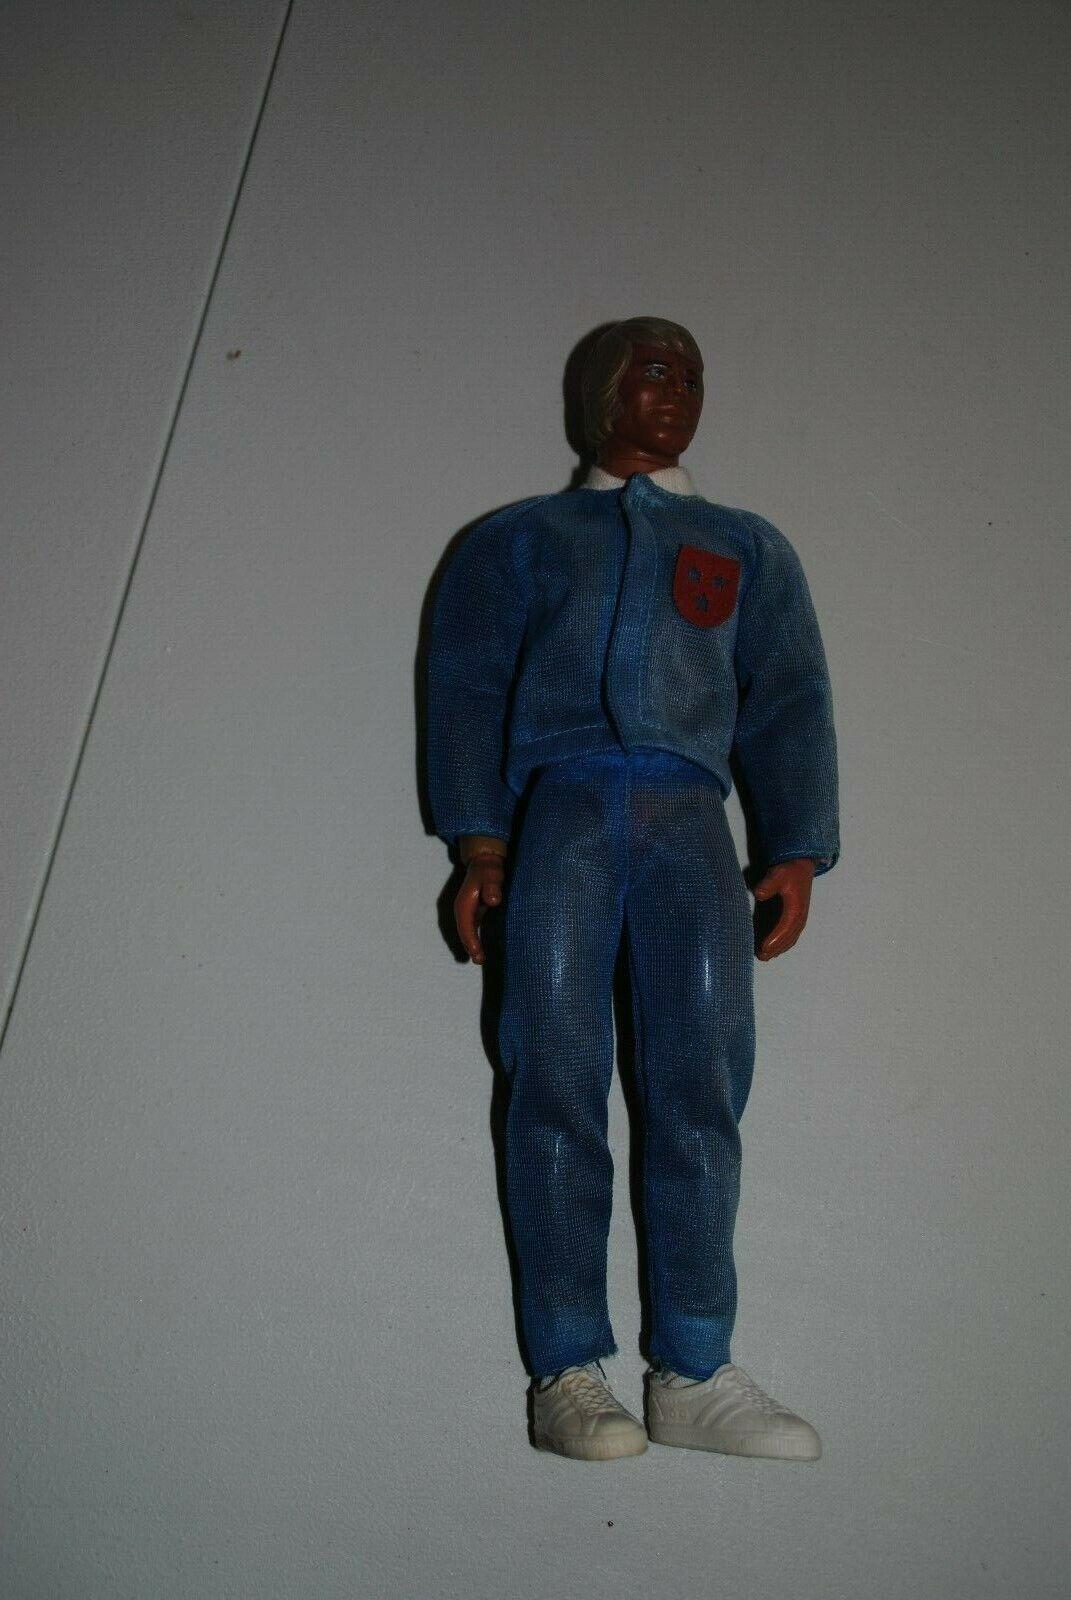 BIG JIM MATTEL     BIG JEFF        SPORTSMAN blueE WARM-UP SUIT     OUTFT  ,NICE